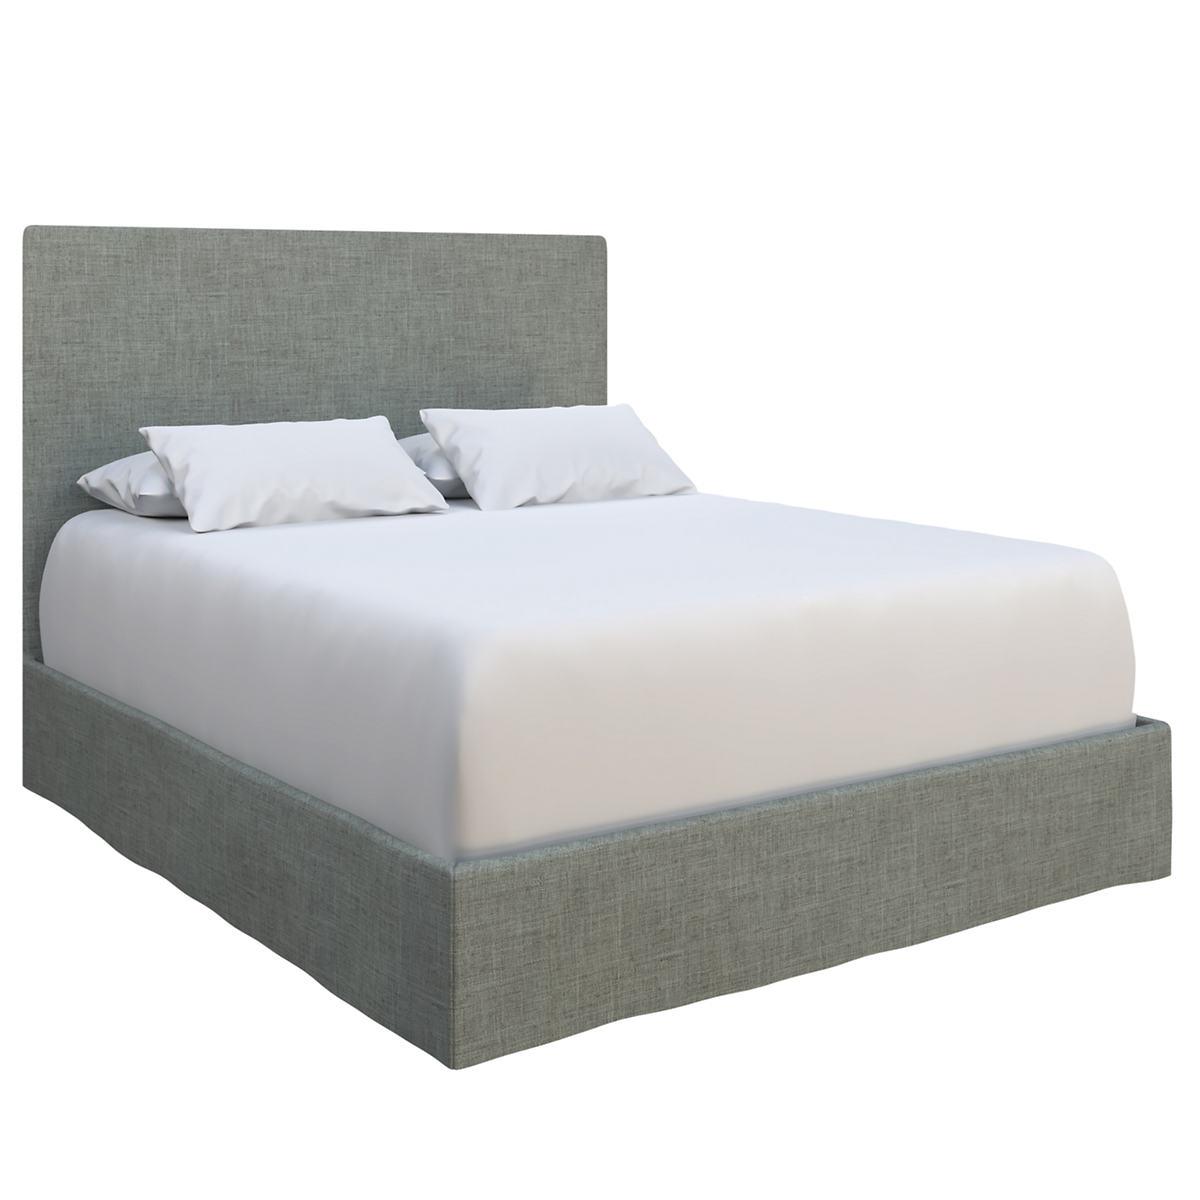 Canvasuede Ocean Langston Bed